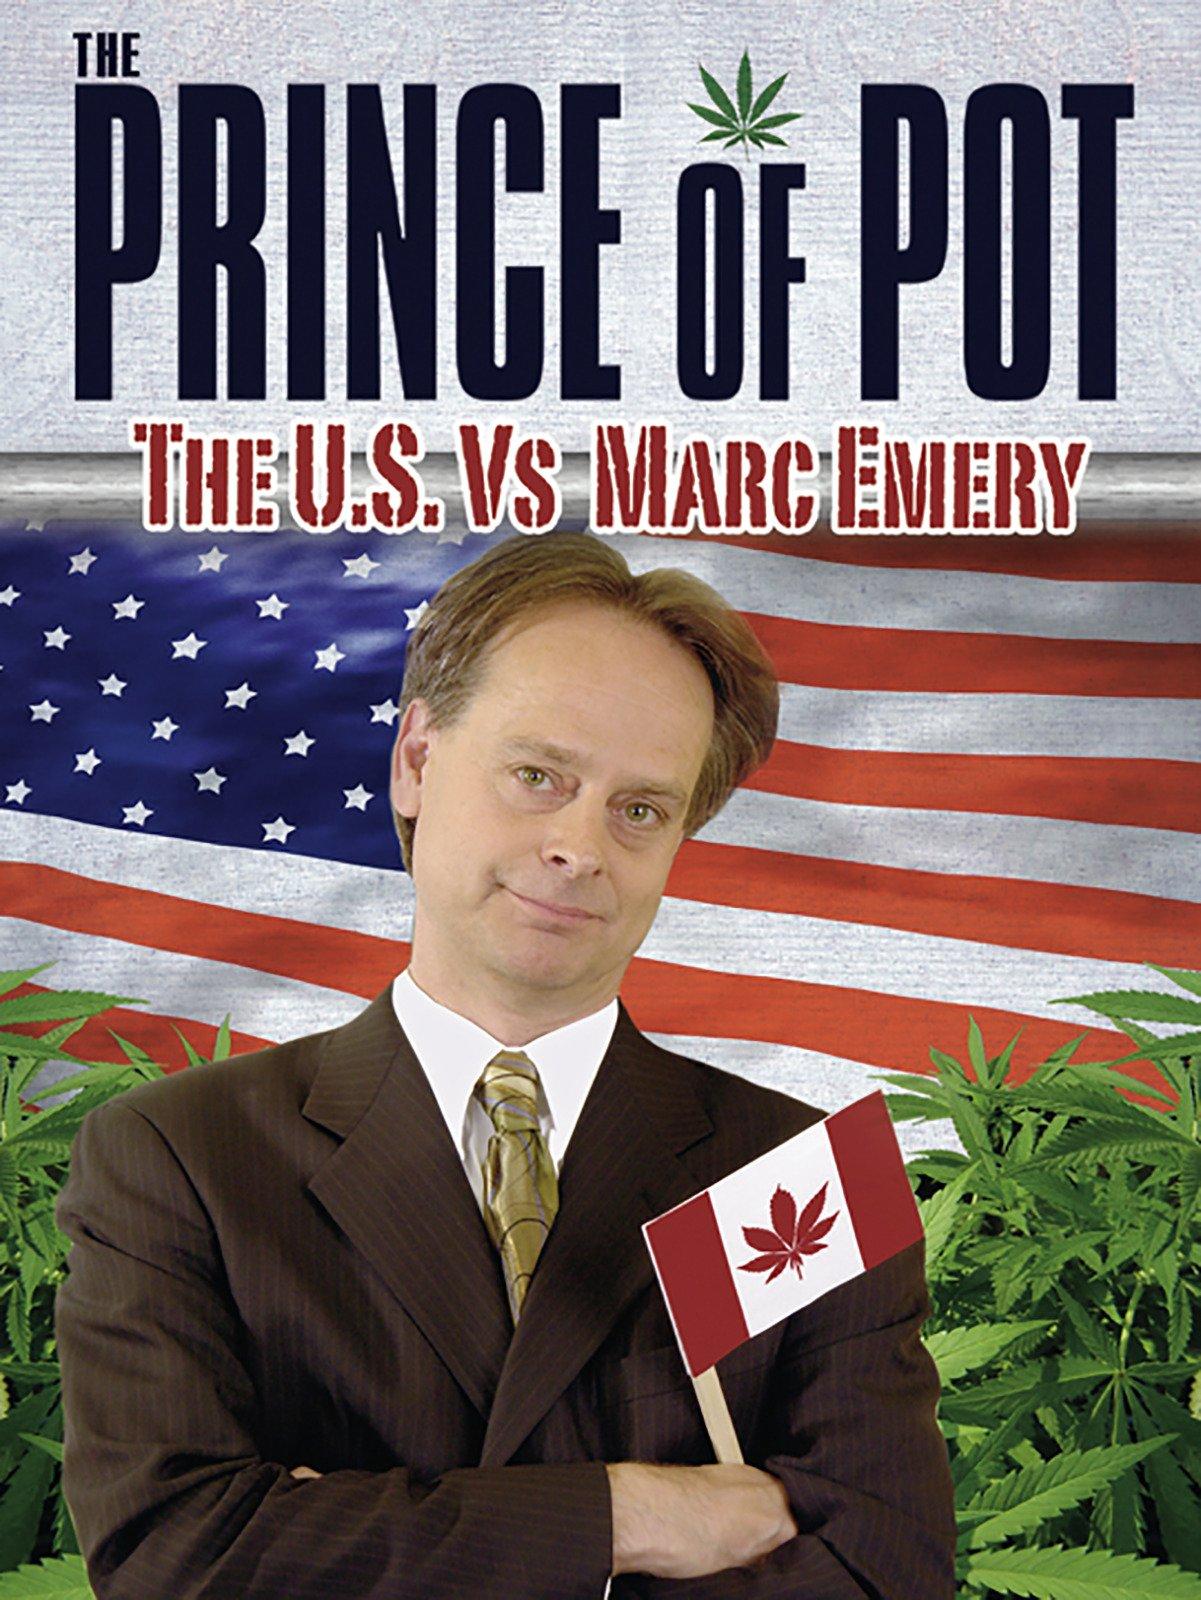 Prince of Pot